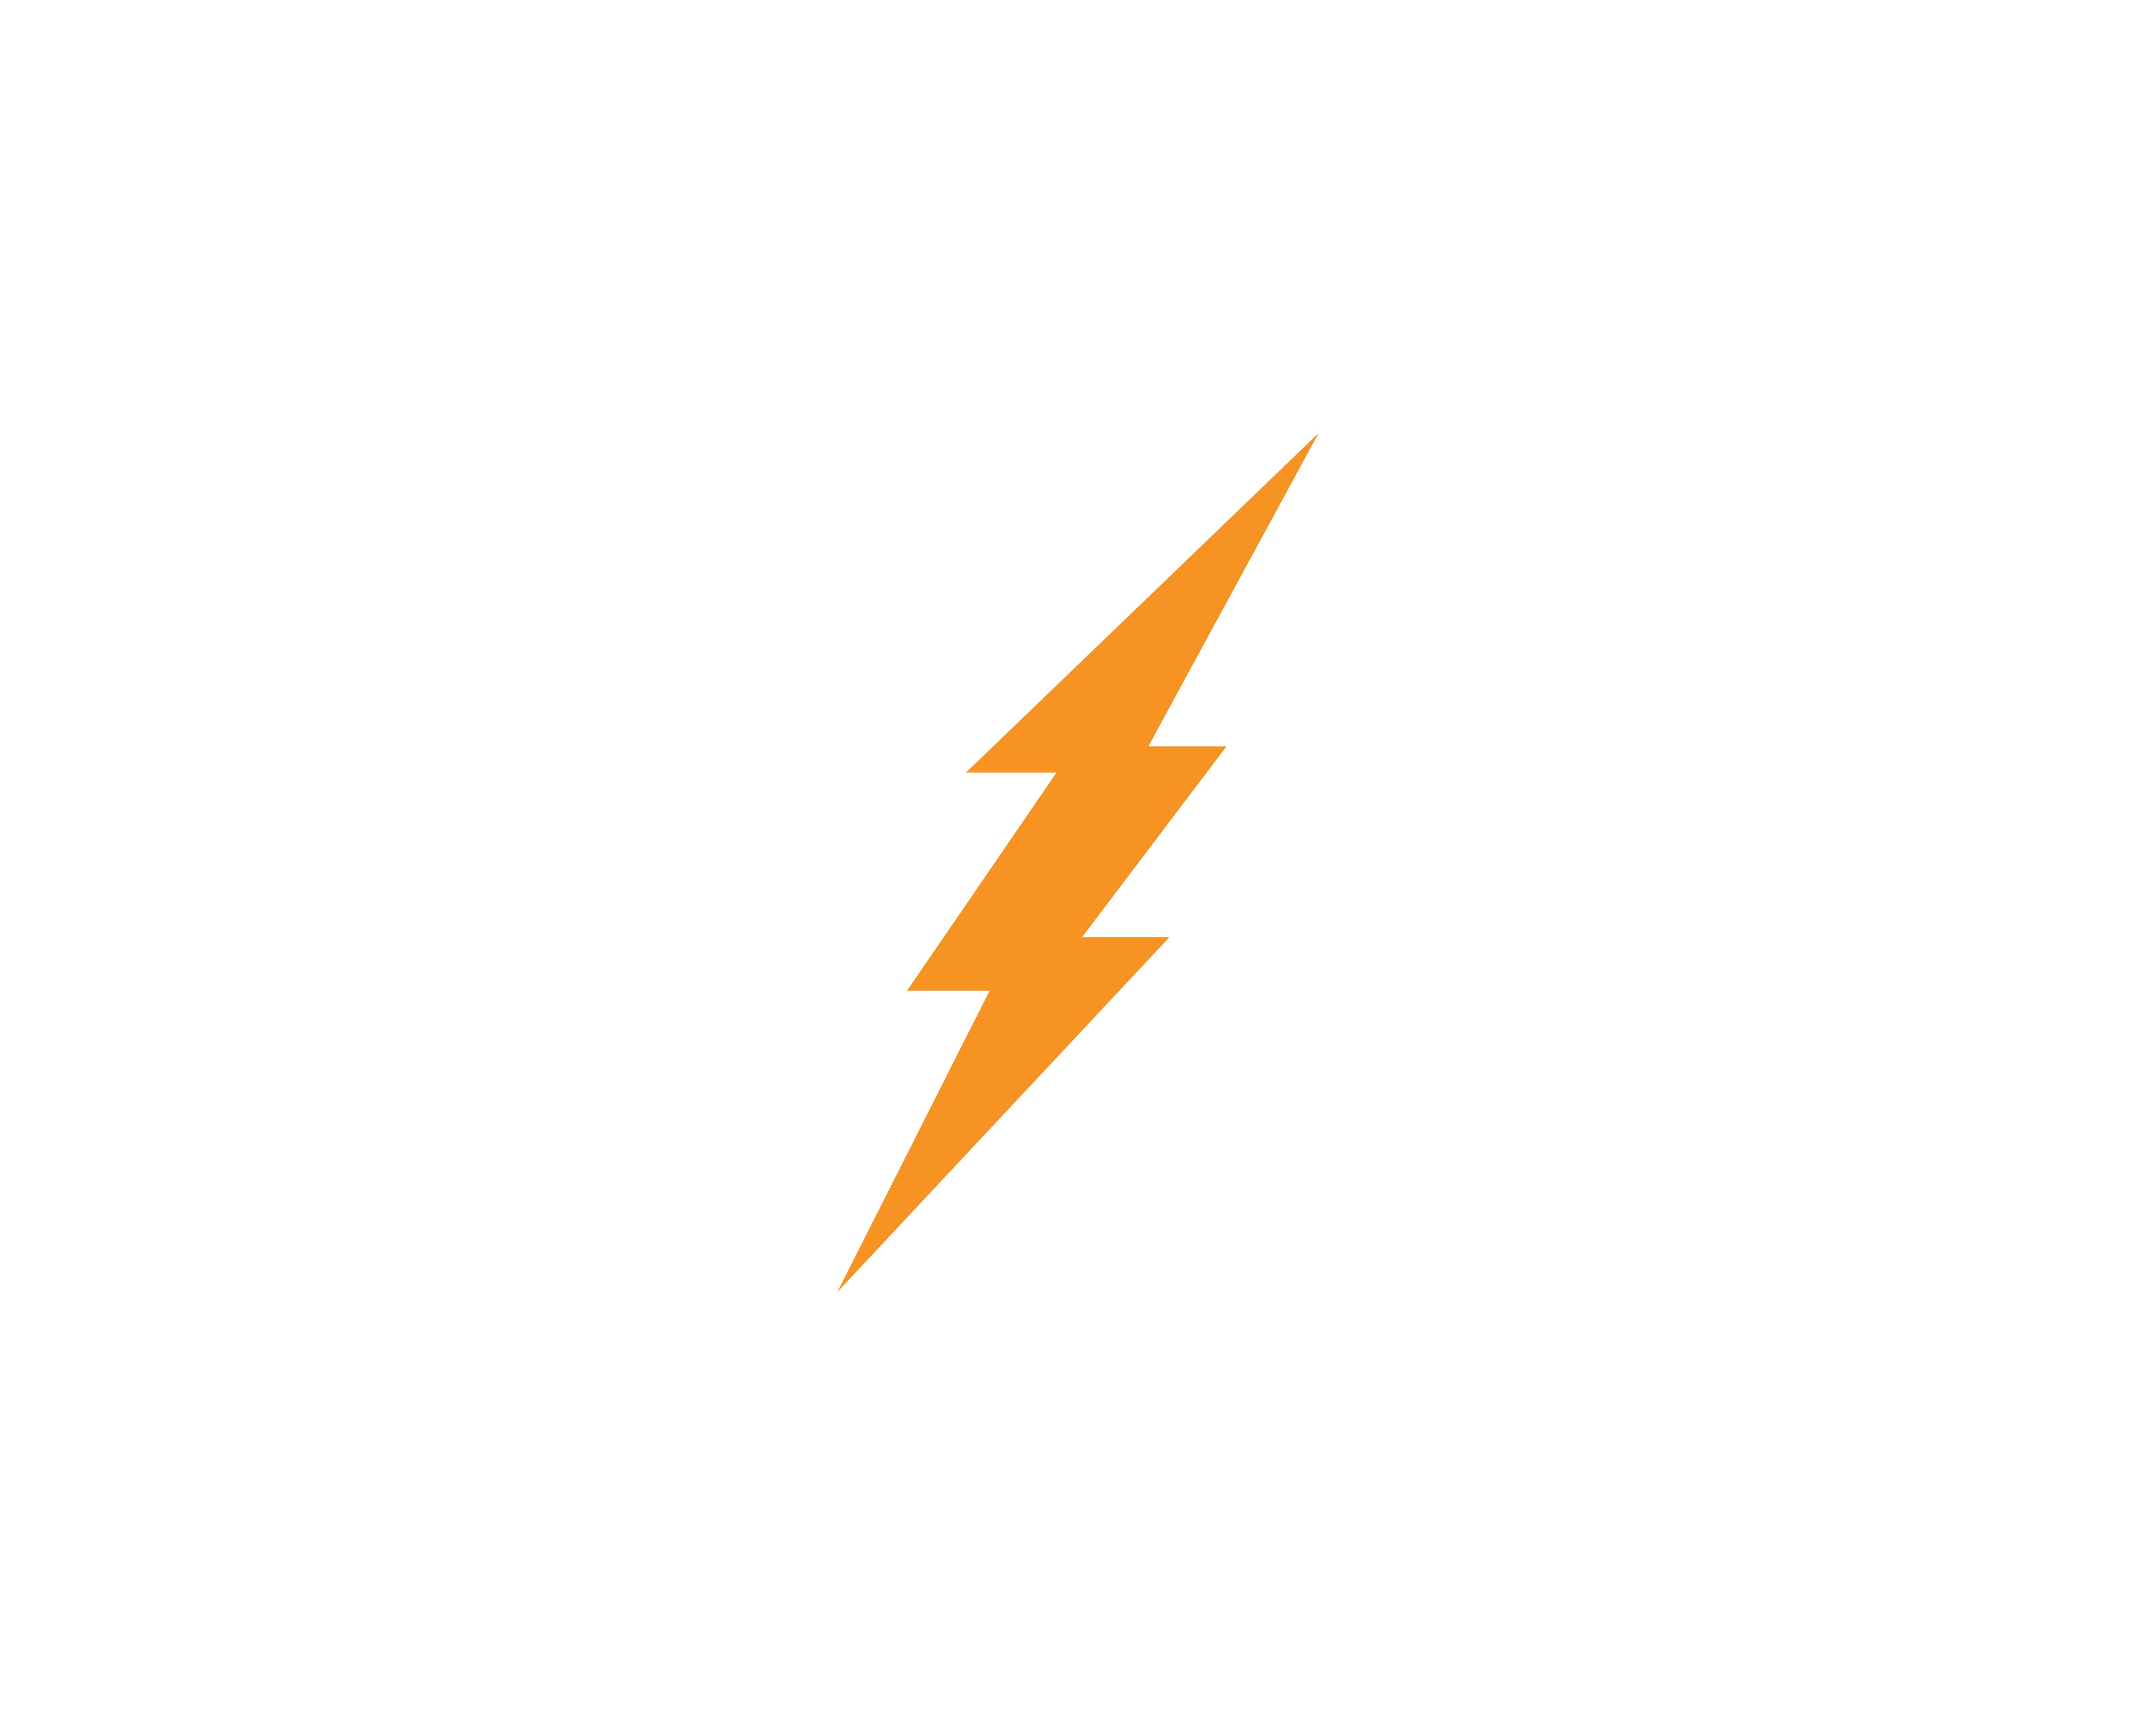 Faster Lightning Logo Template Vector Icon Illustration Design Download Free Vectors Clipart Graphics Vector Art